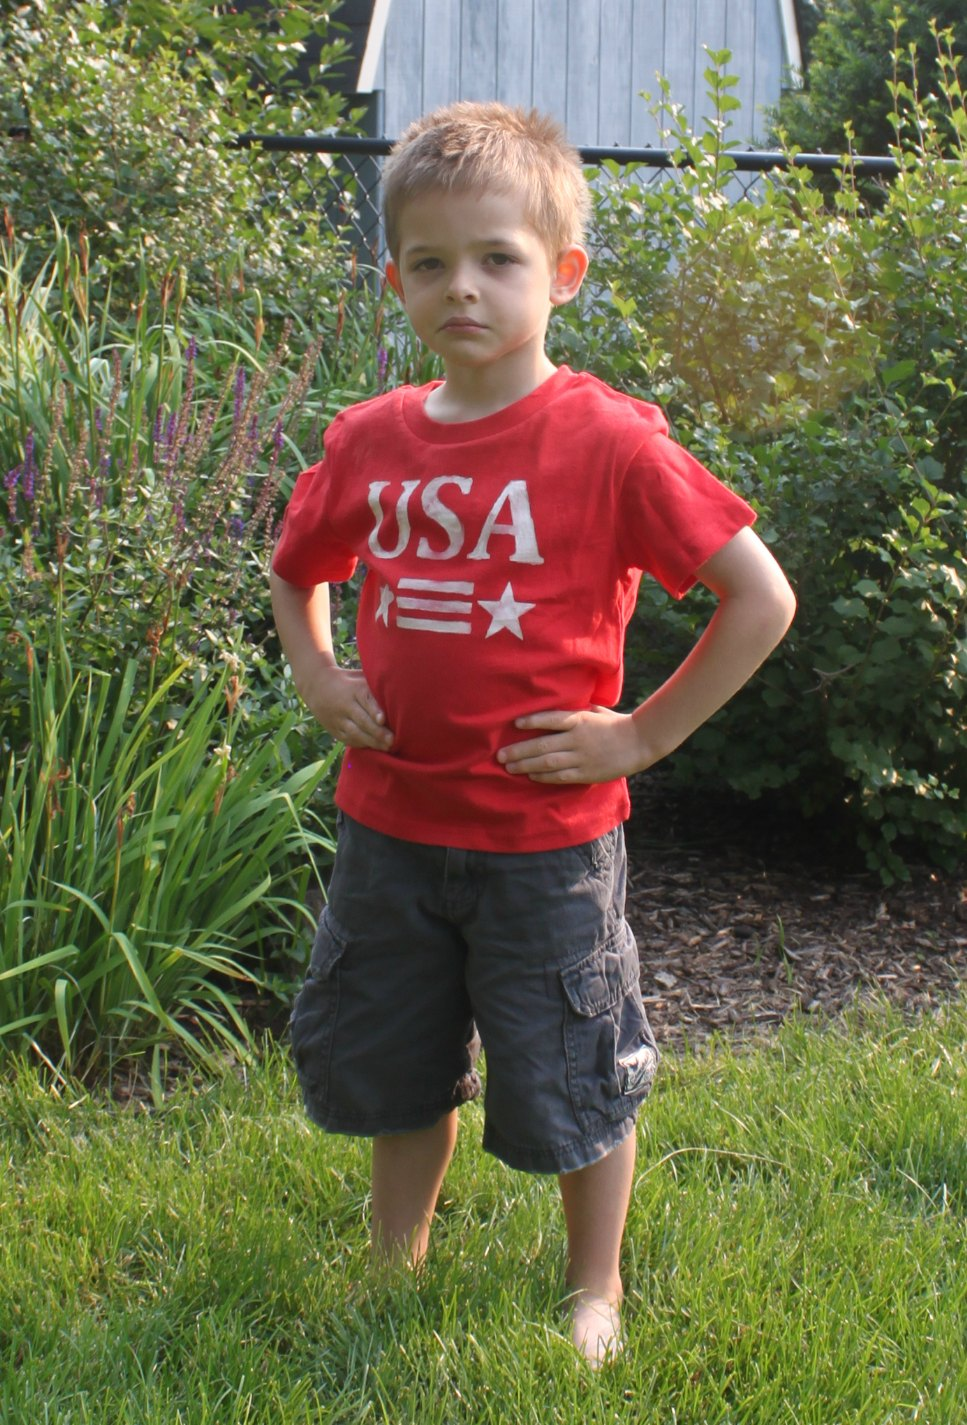 Bleach Pen T-shirt for 4th of July